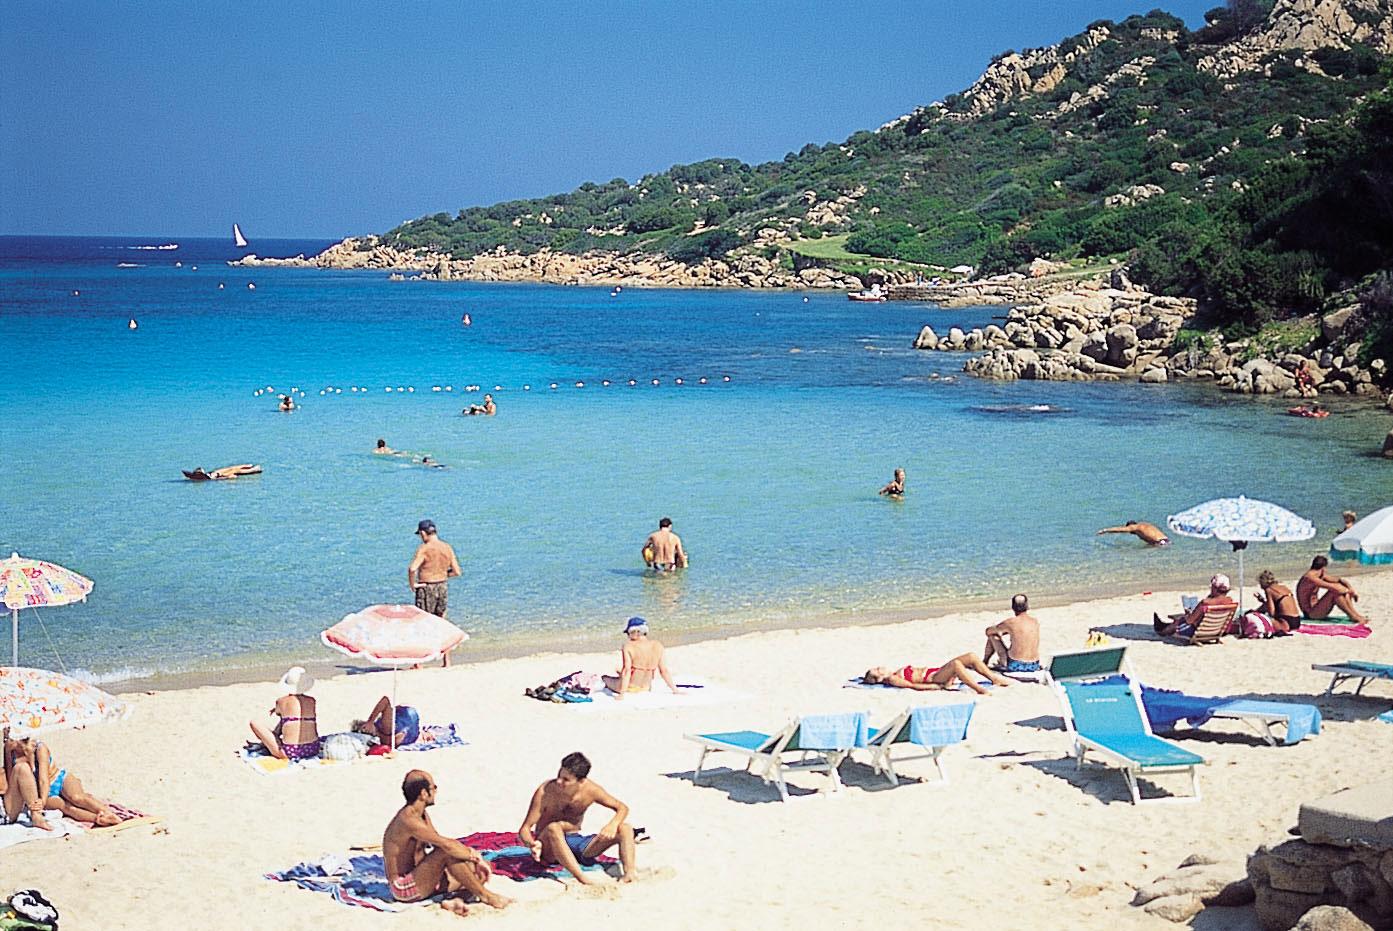 Club Hotel Baia Sardinia